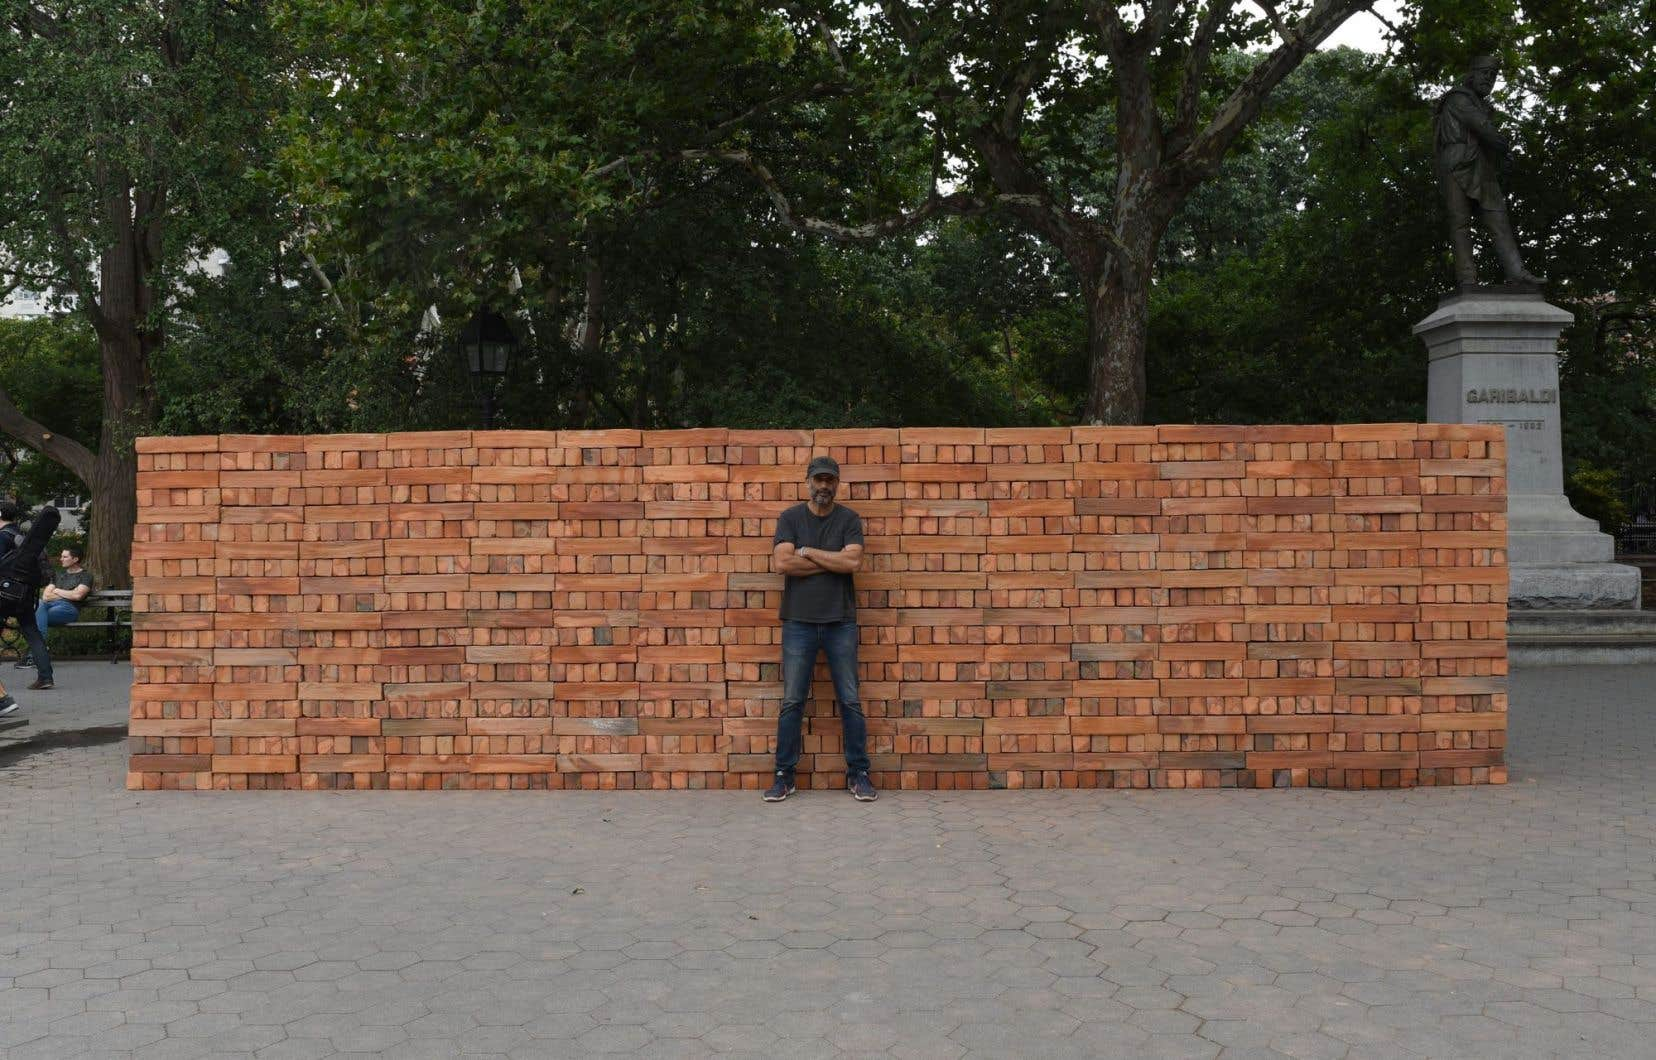 L'artiste mexicain Bosco Sodi devant son installation éphémère «Muro» dans le parc Washington Square de Greenwich, à New York, jeudi